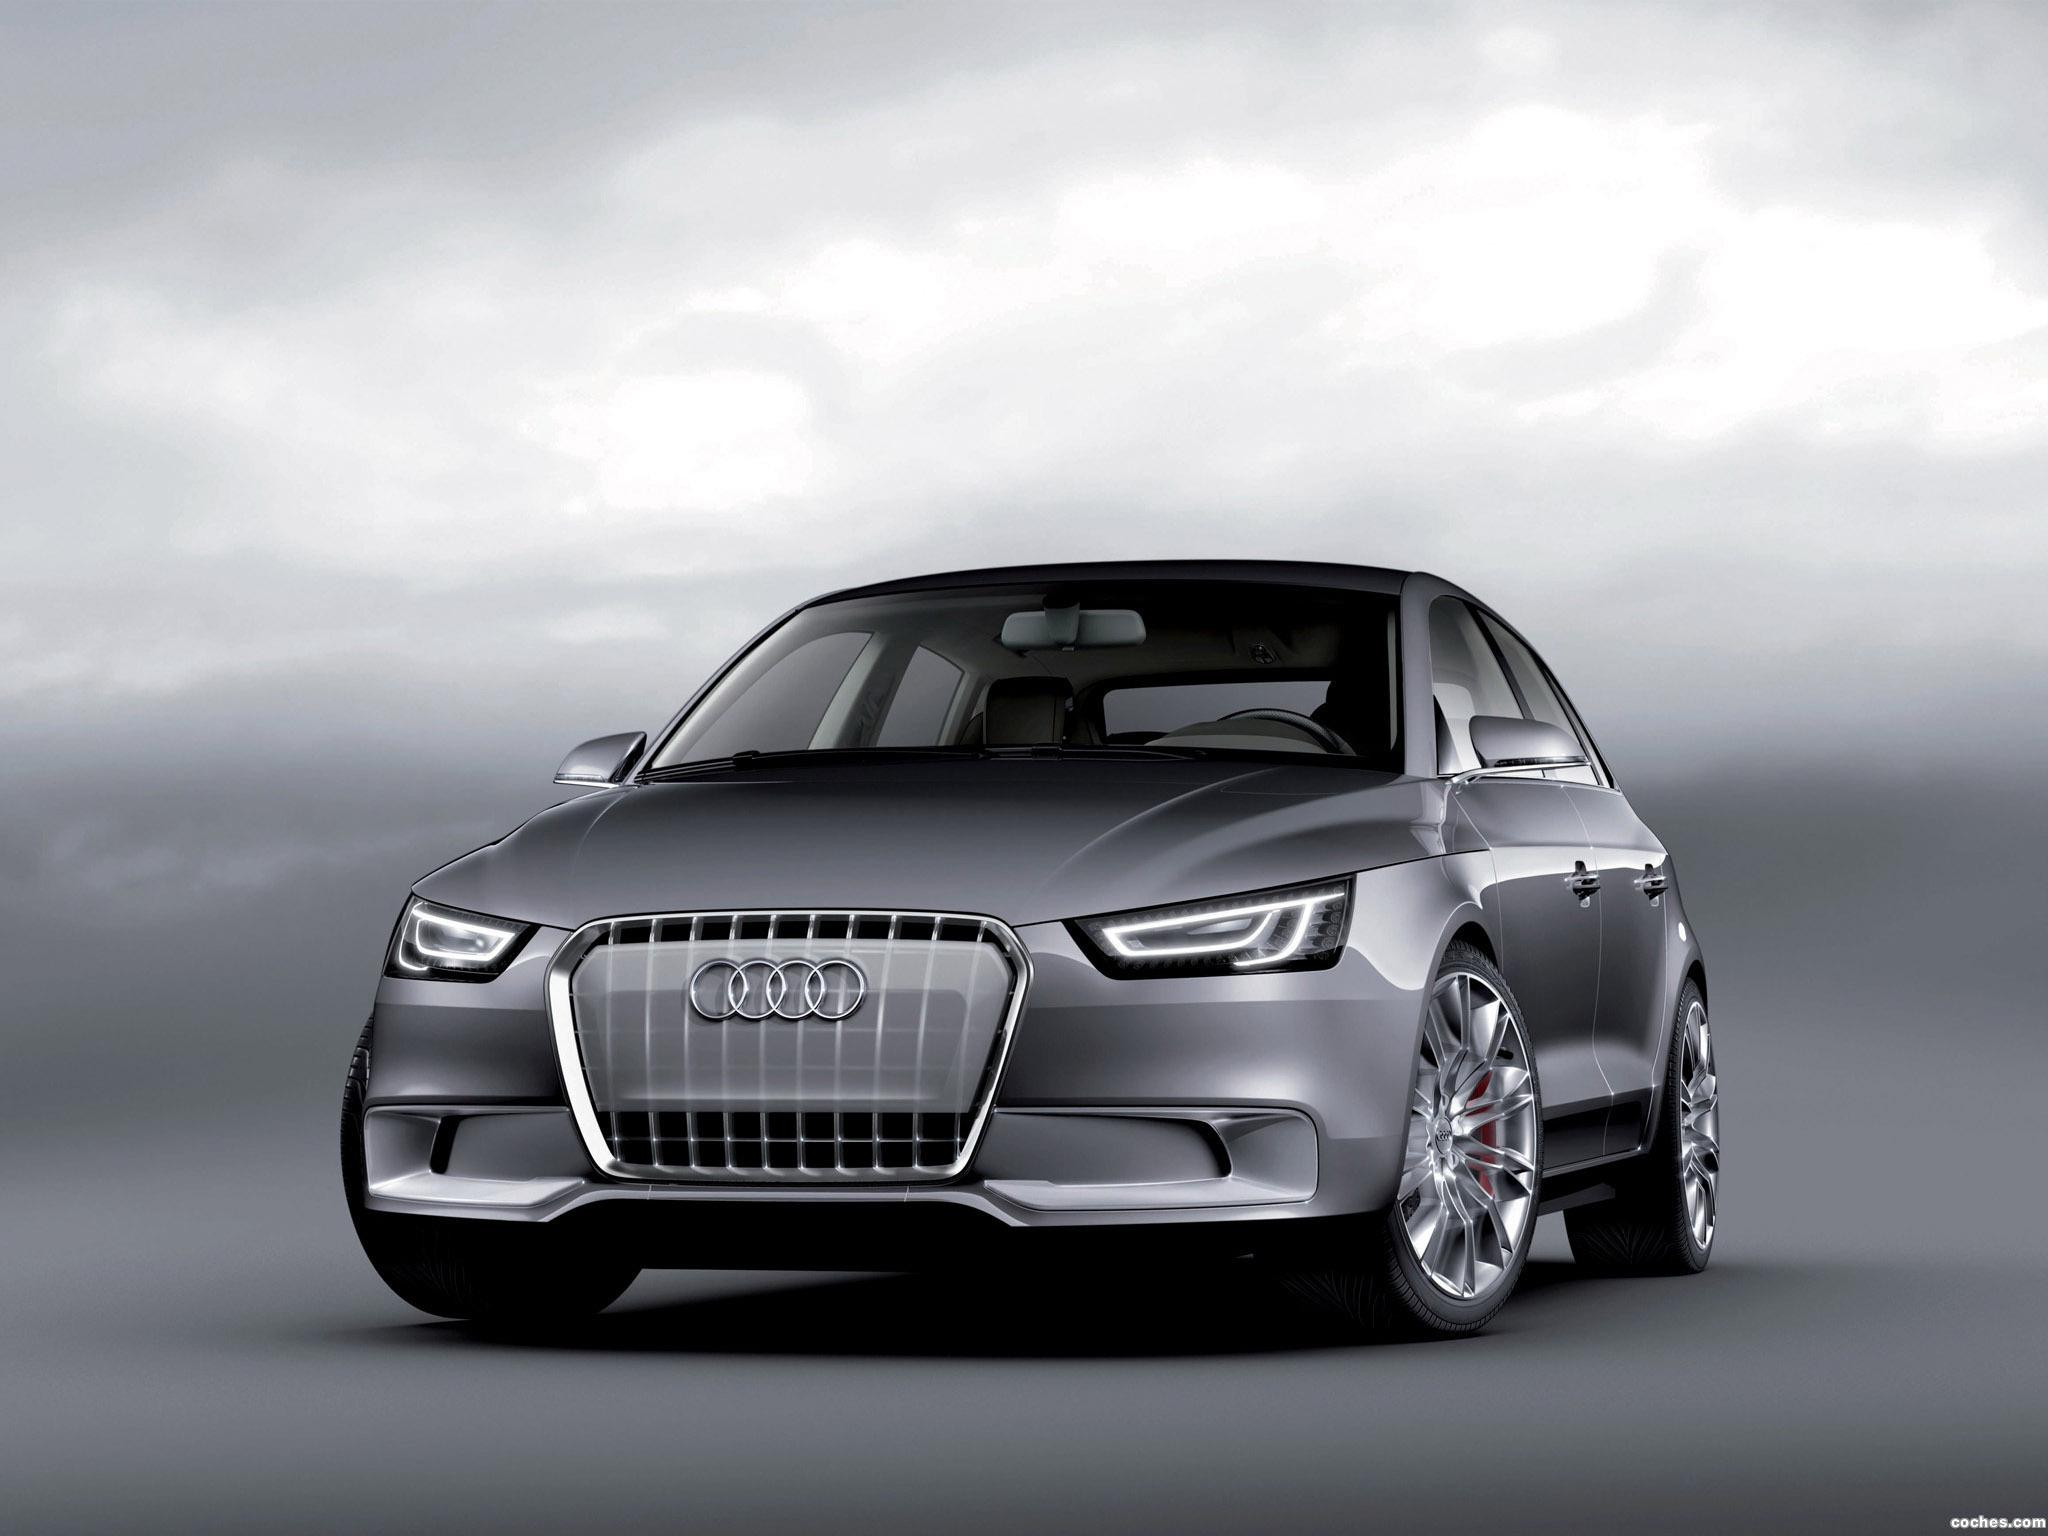 Foto 0 de Audi A1 Sportback Concept 2008